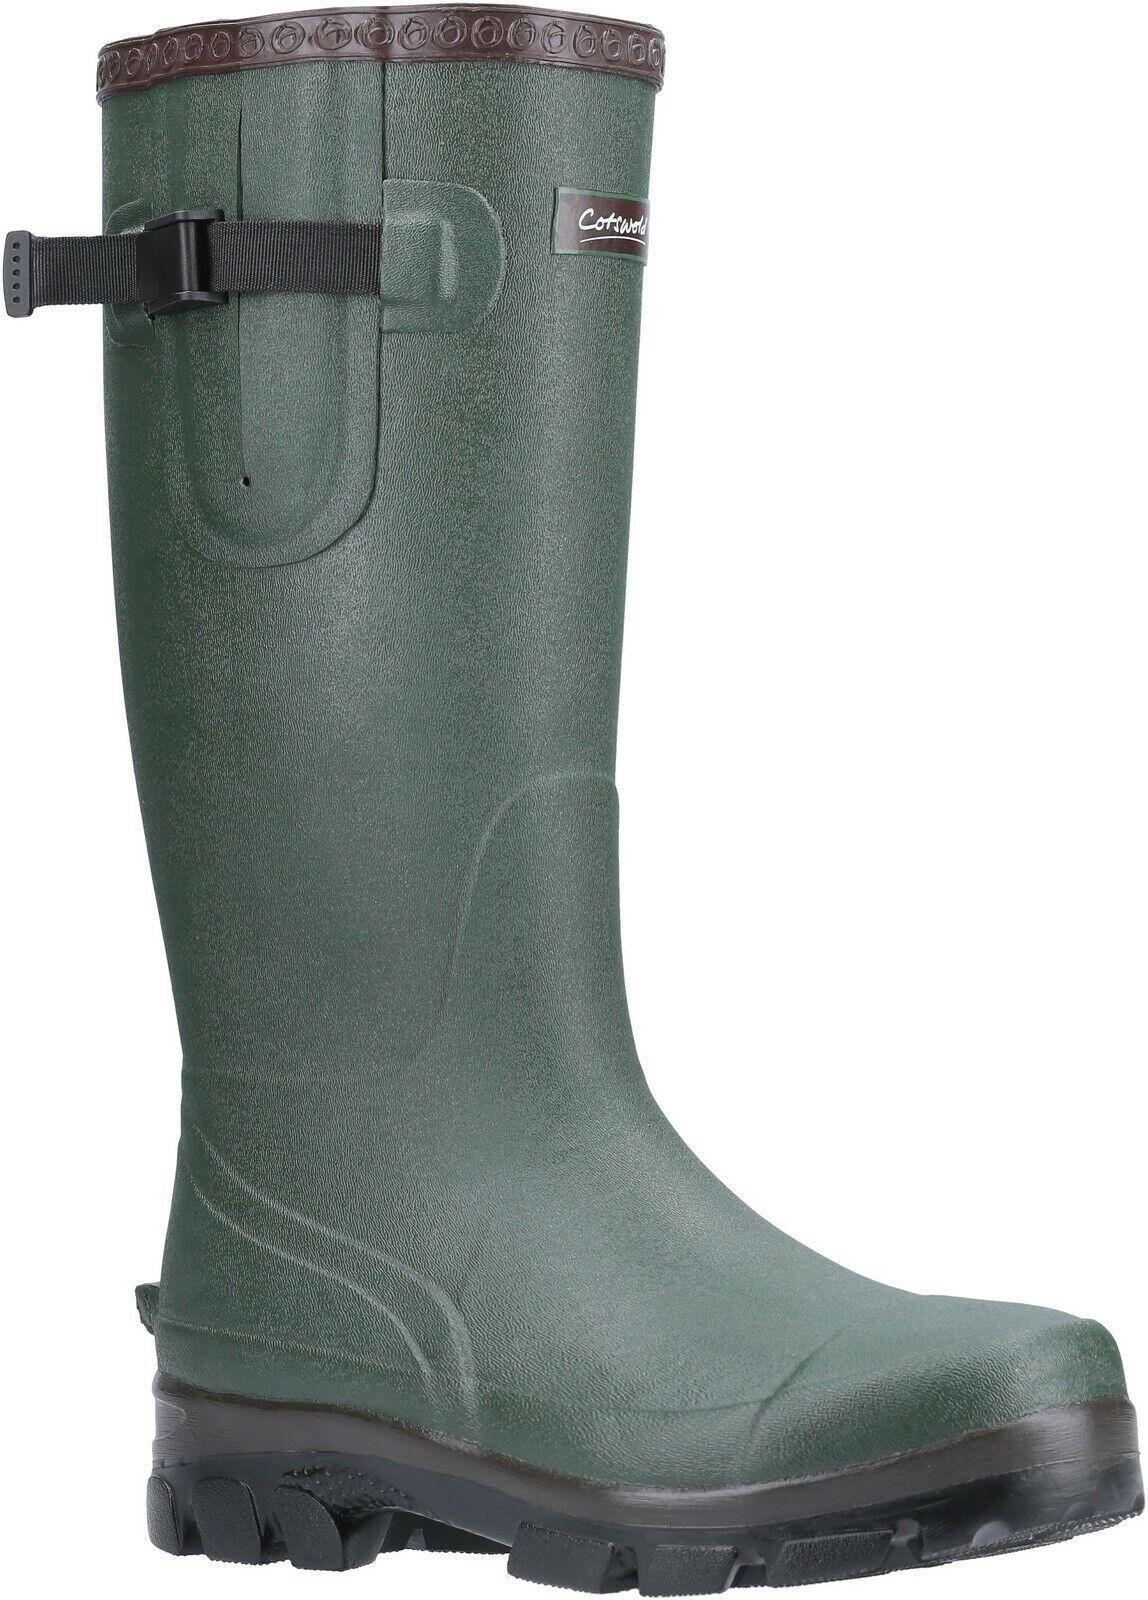 Cotswold Grange green neoprene adjustable wellington boot